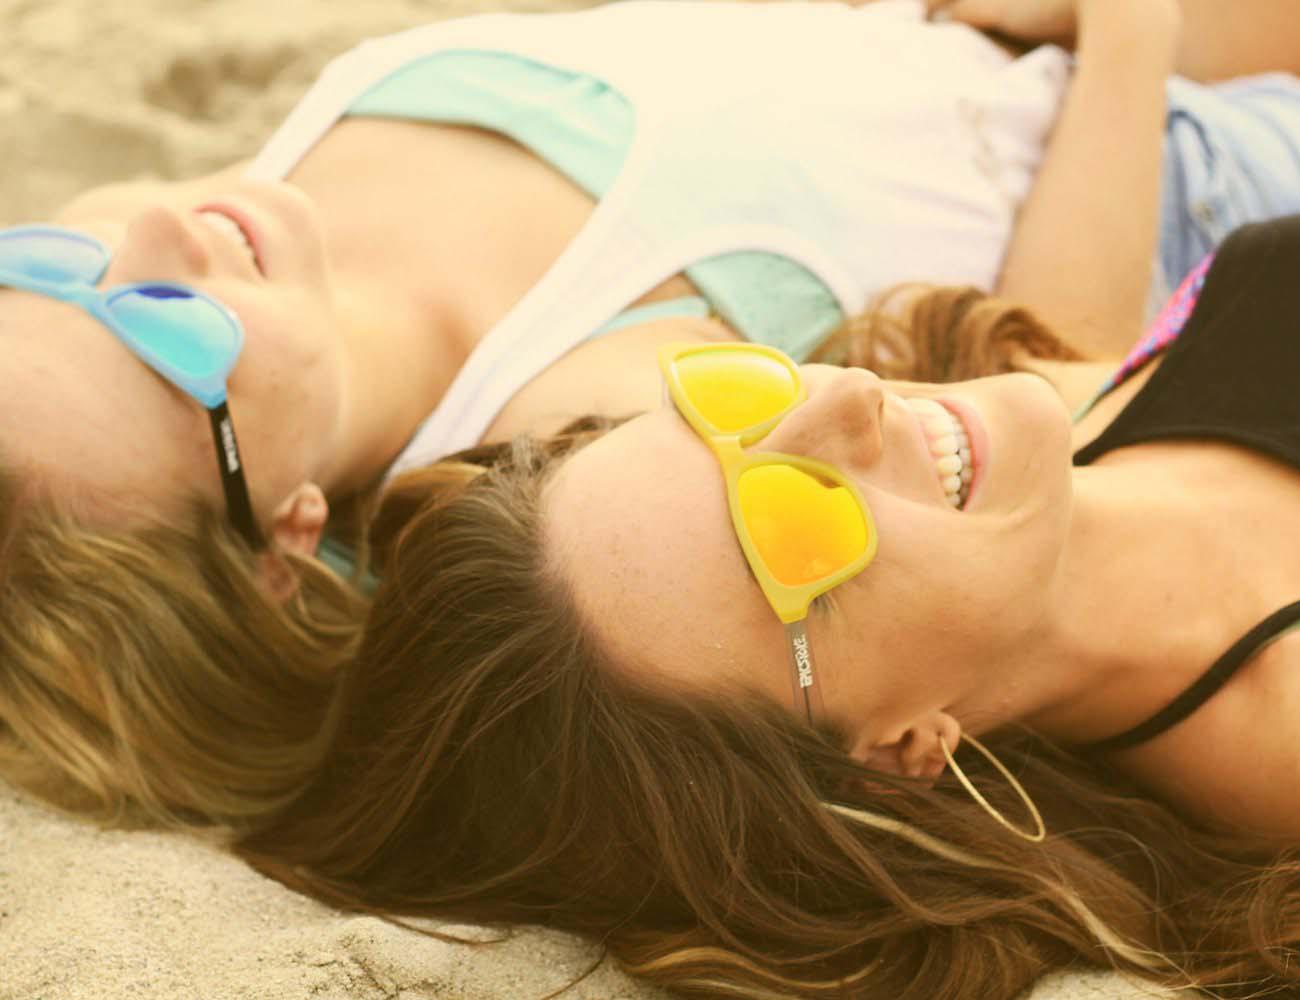 Carvers Sunglasses – Rediscover the Sun